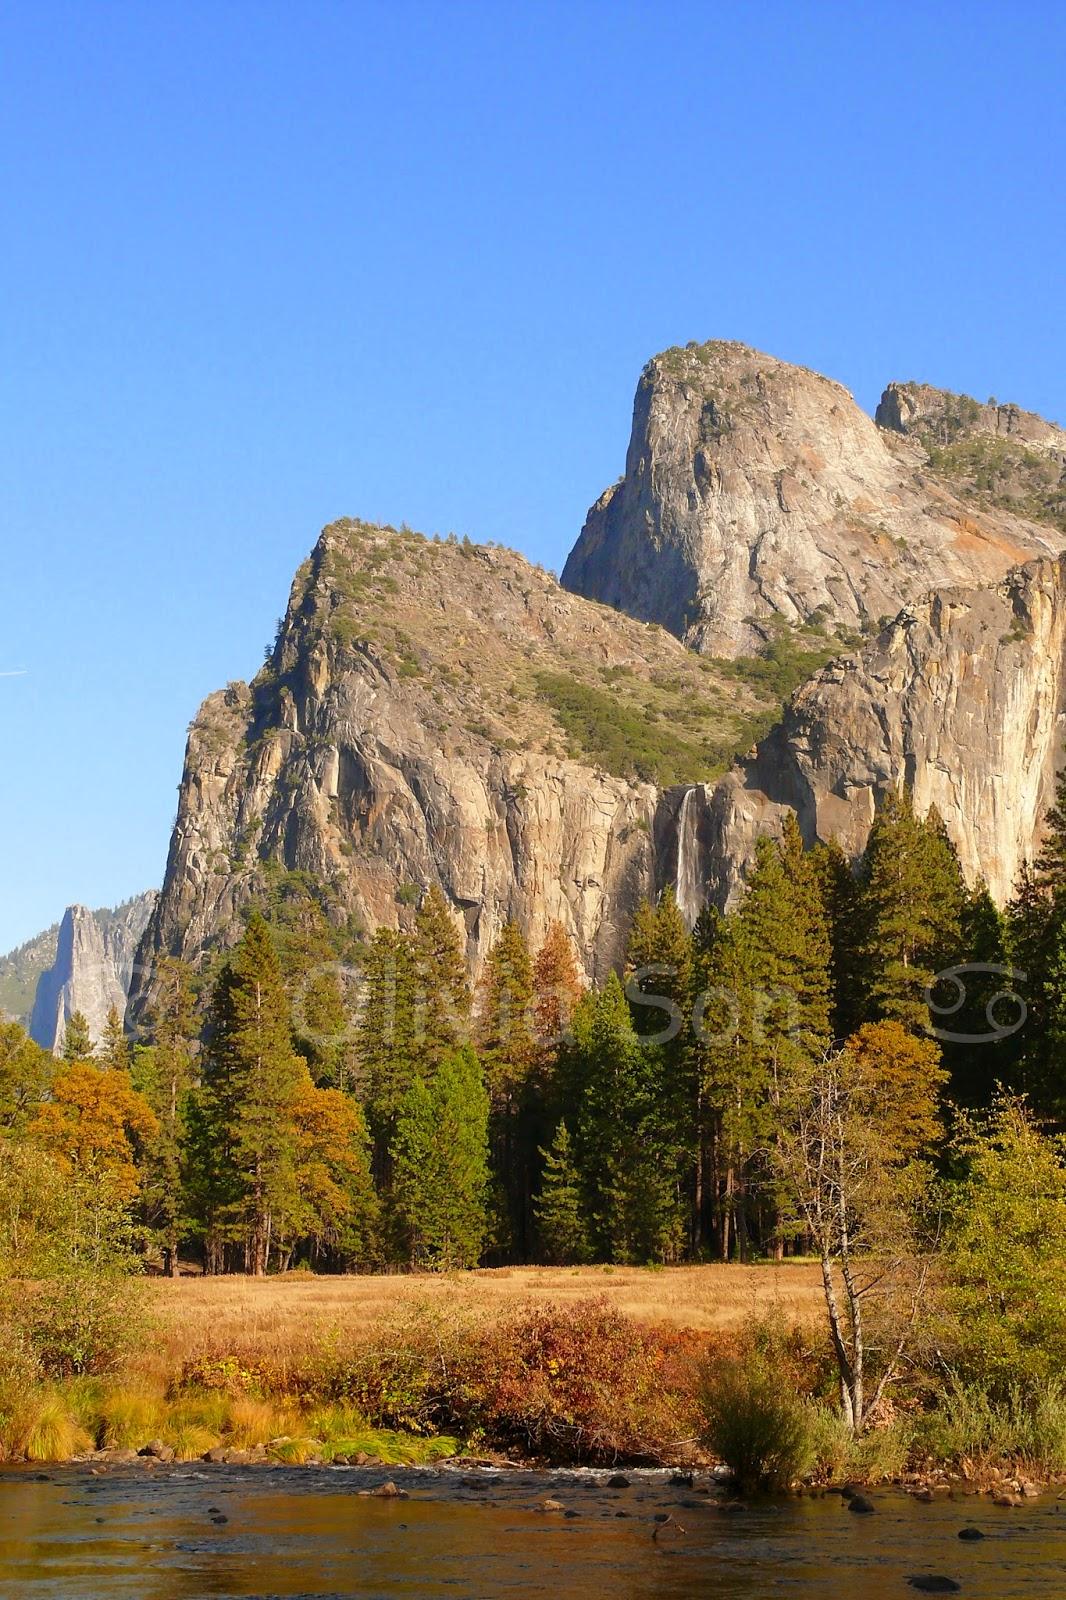 bridal veil falls, Yosemite National Park, California, USA